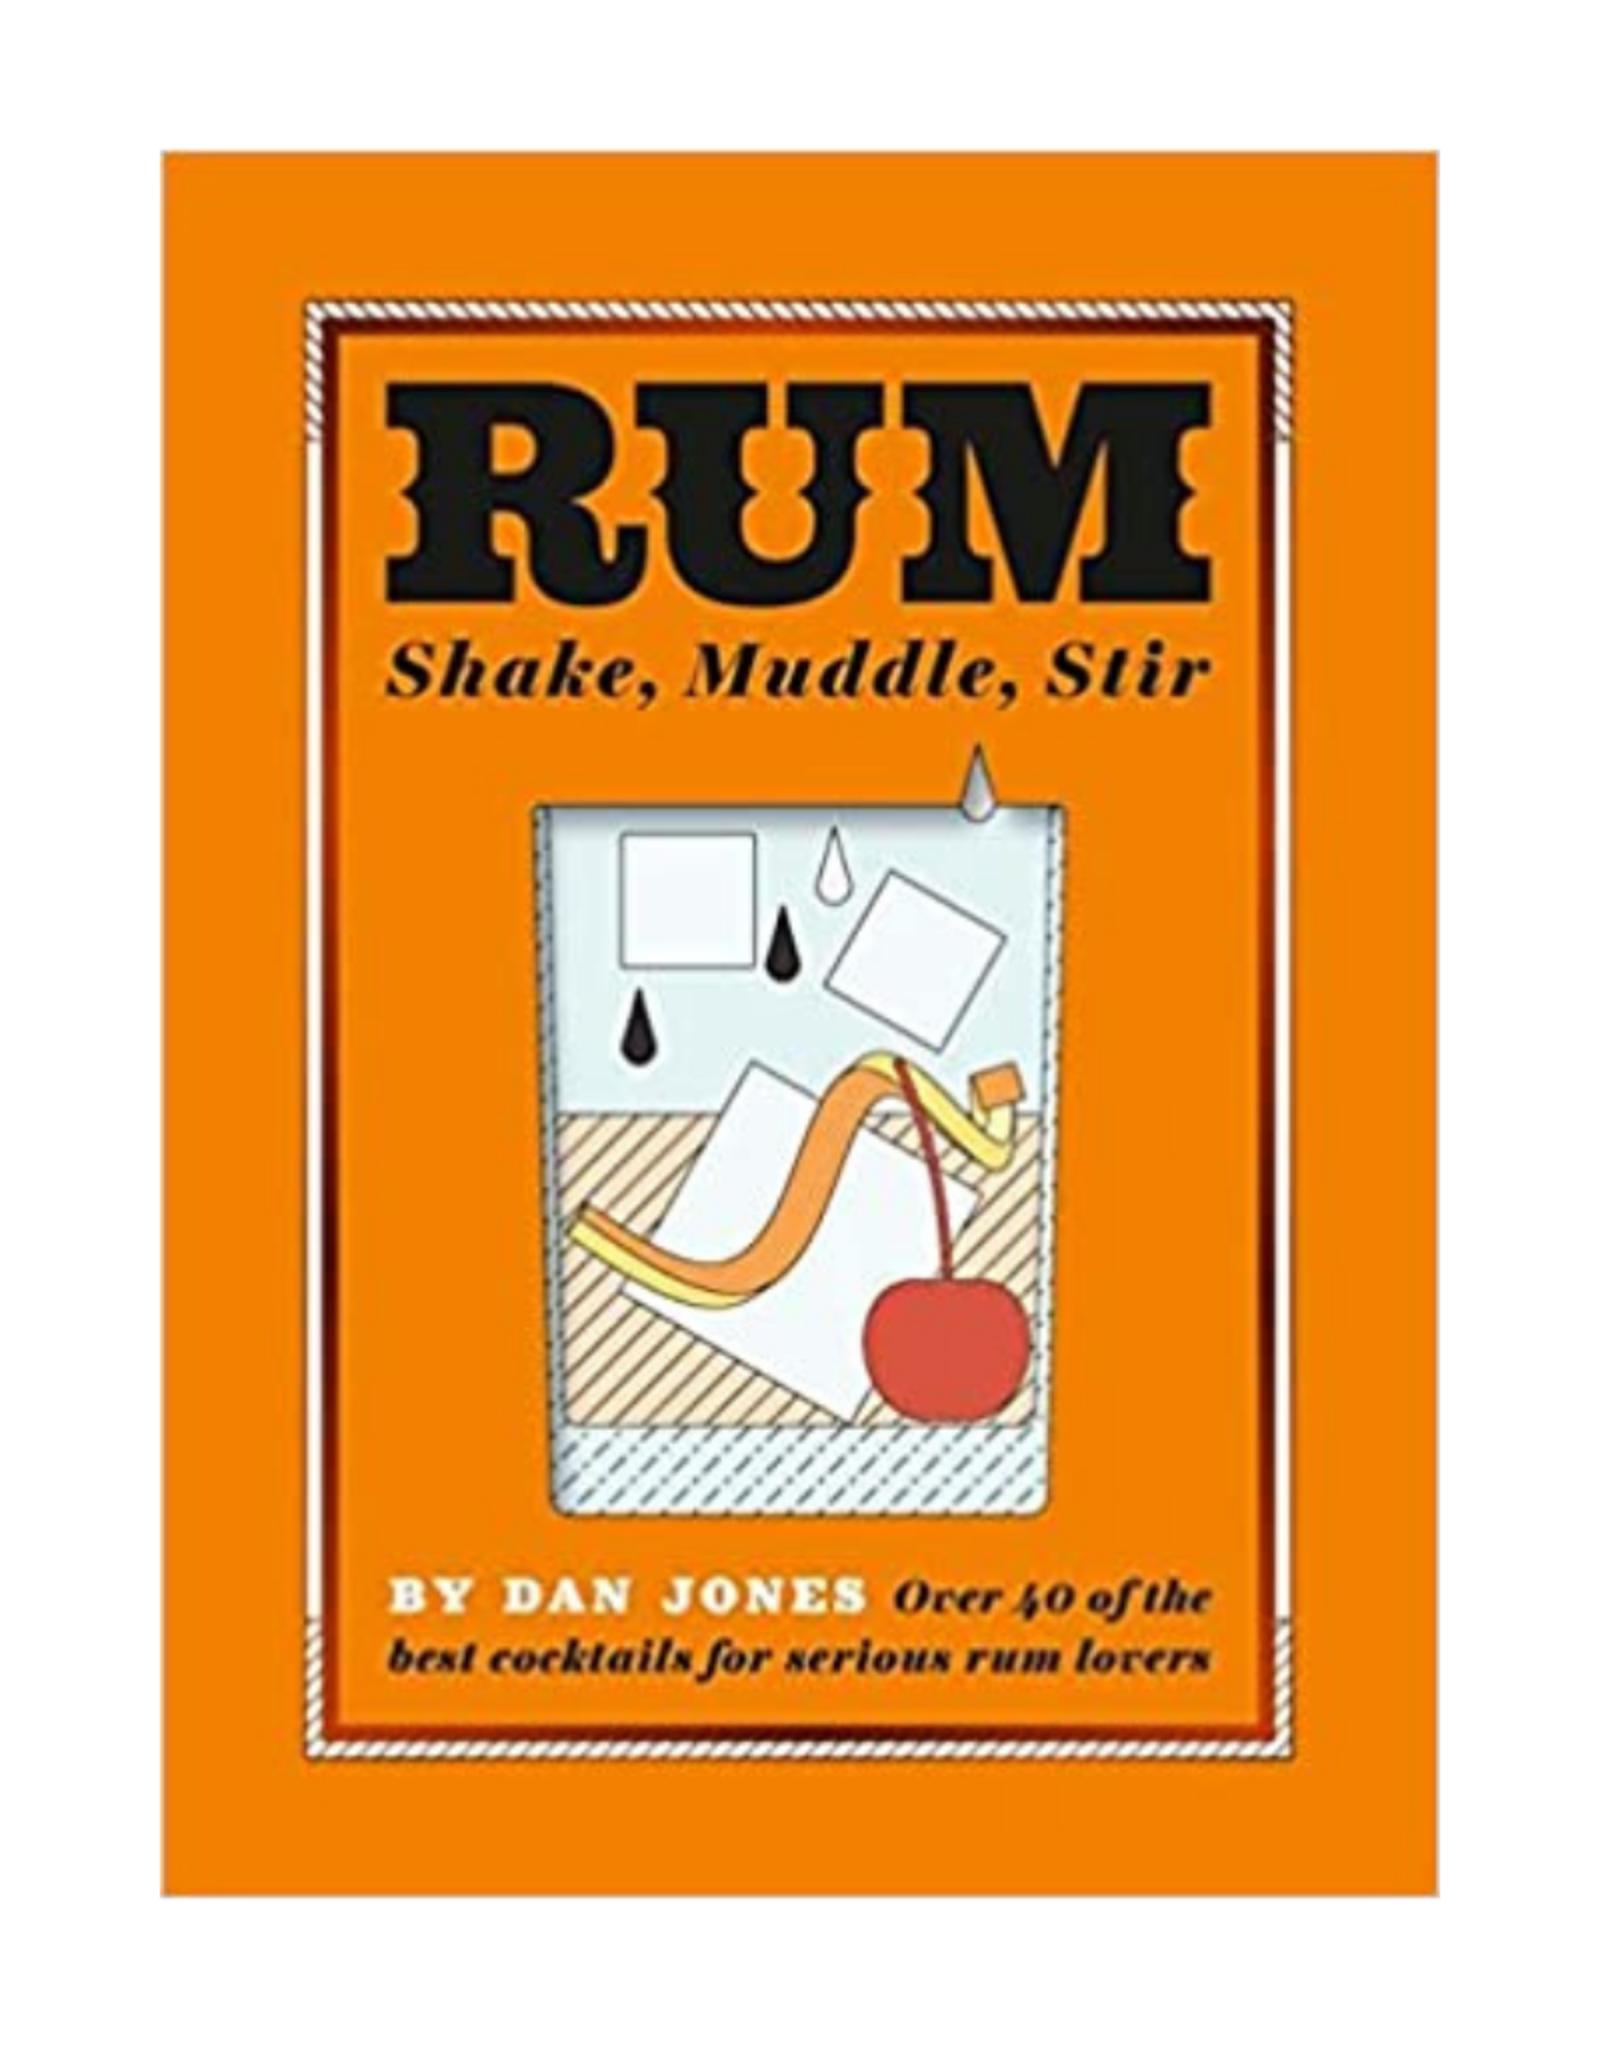 Chronicle Books Rum: Shake, Muddle, Stir by Dan Jones